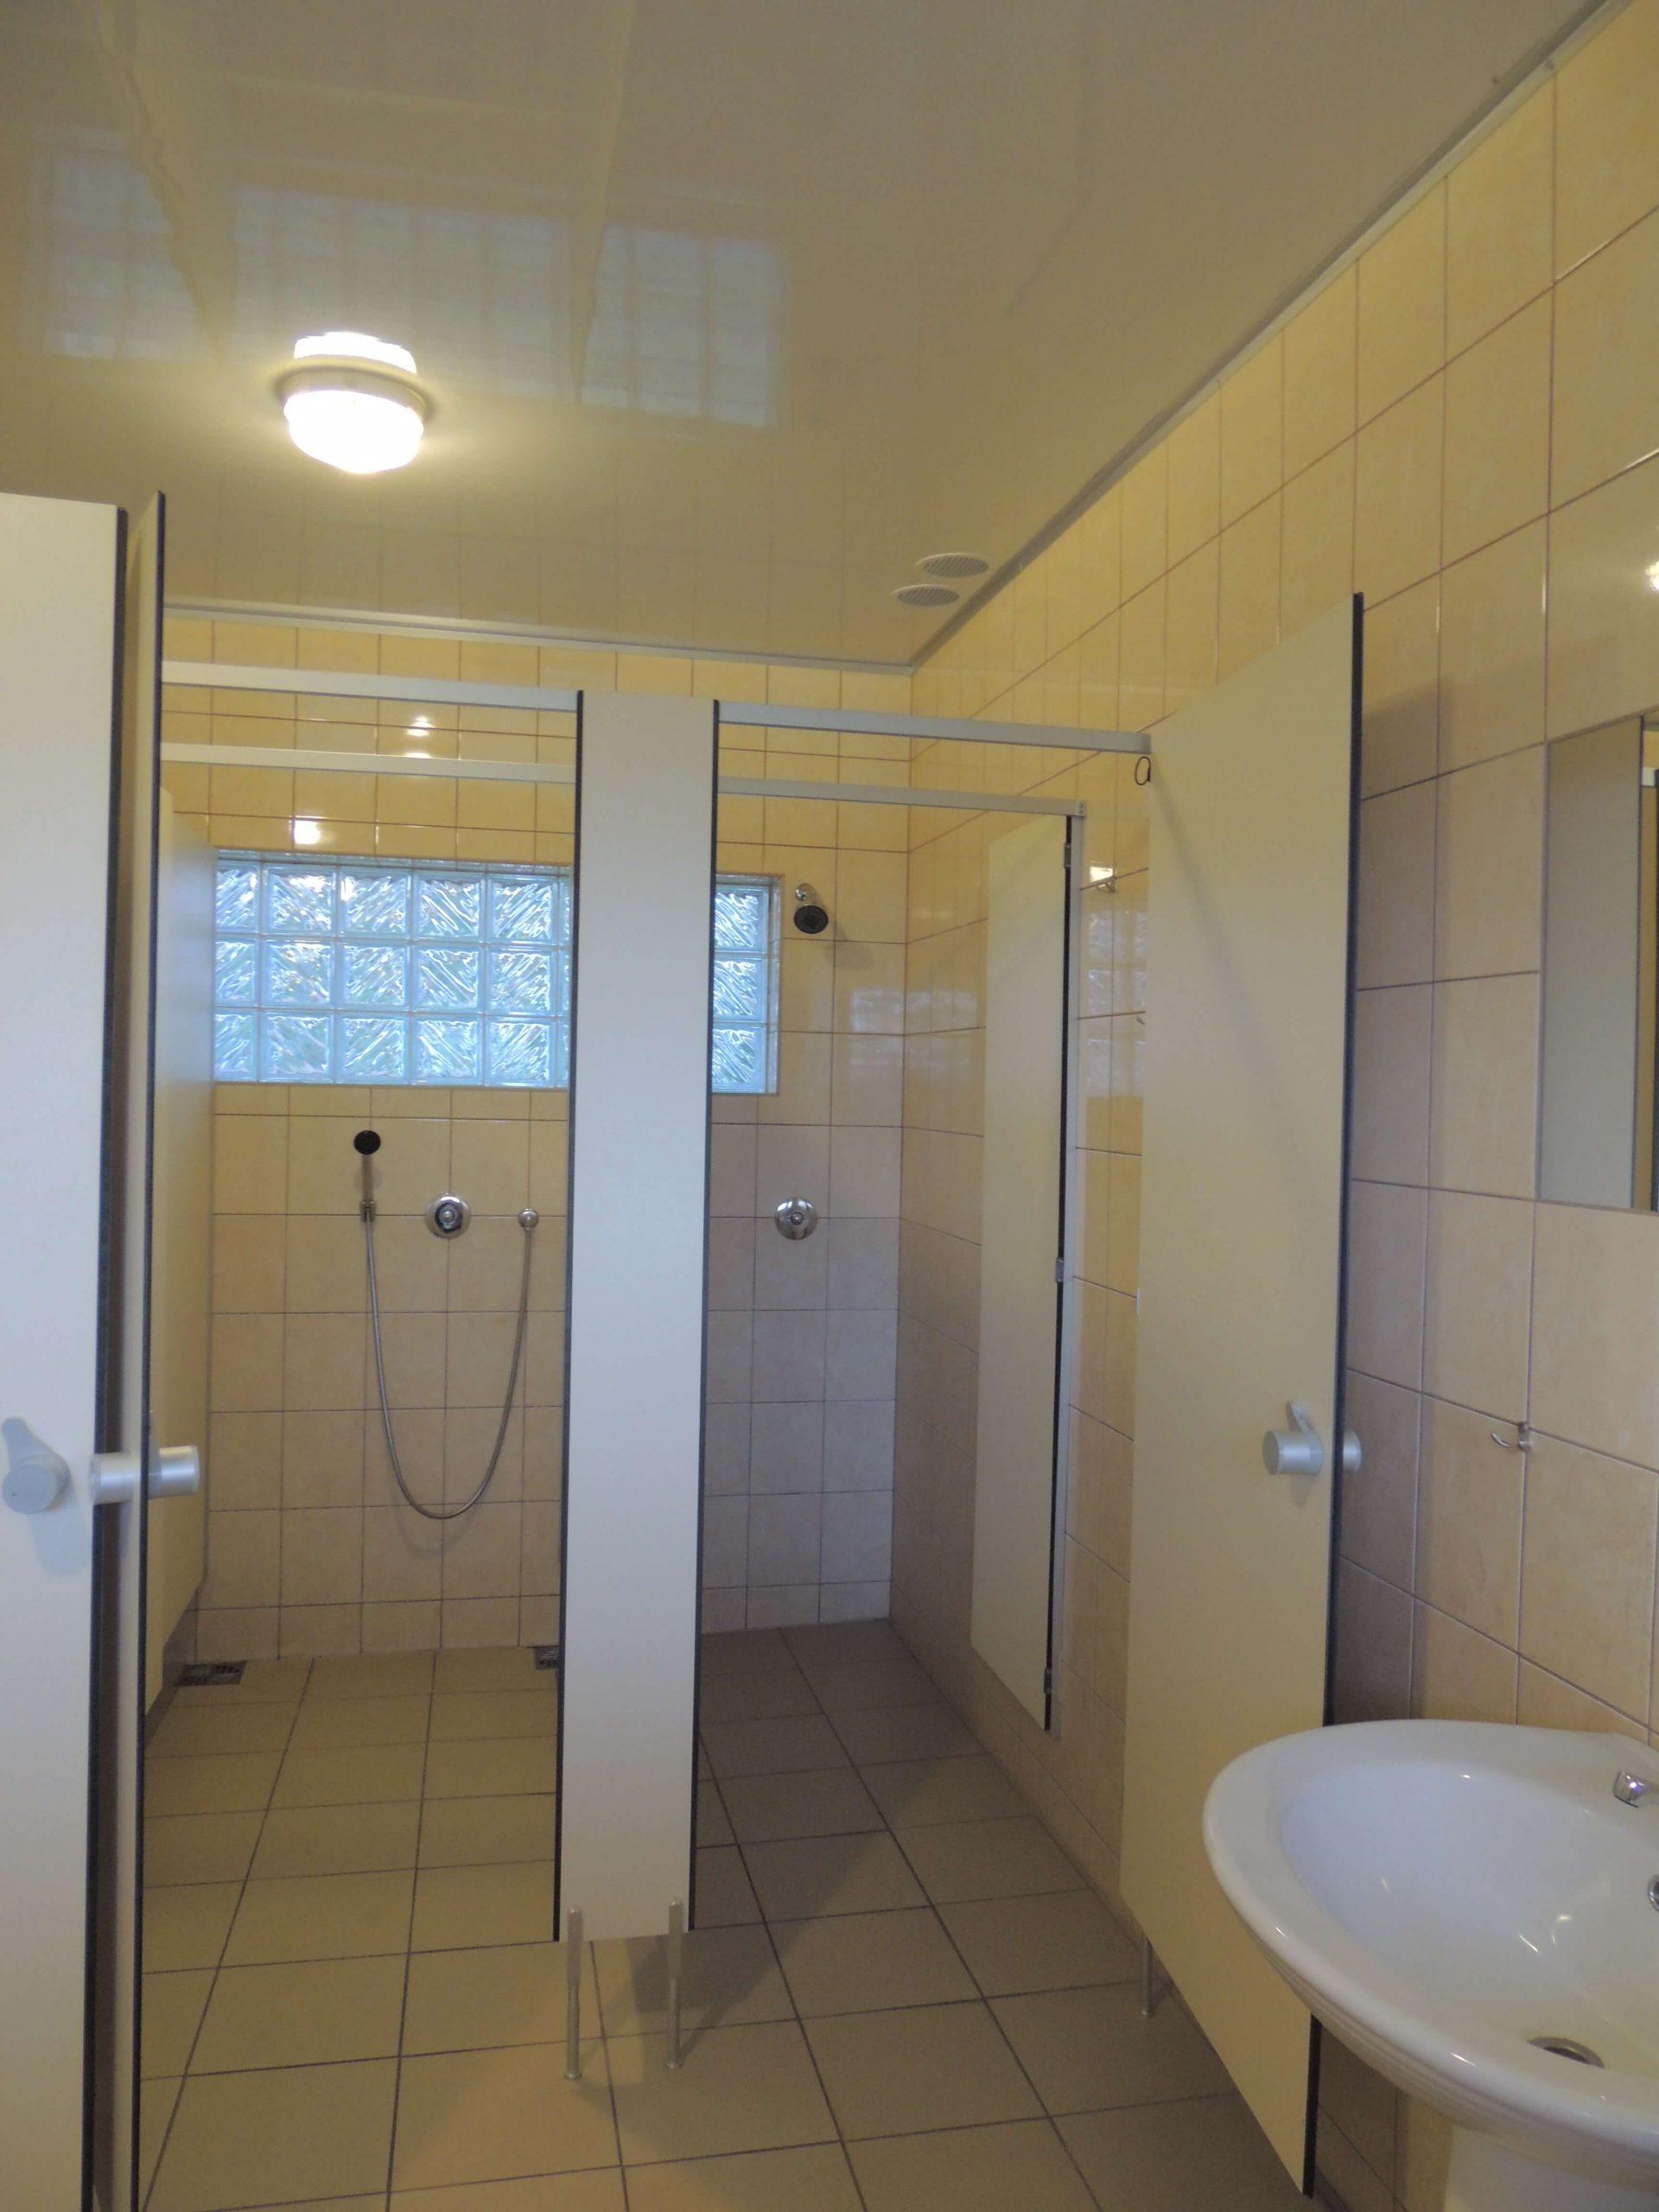 budynek: sanitariaty - prysznice